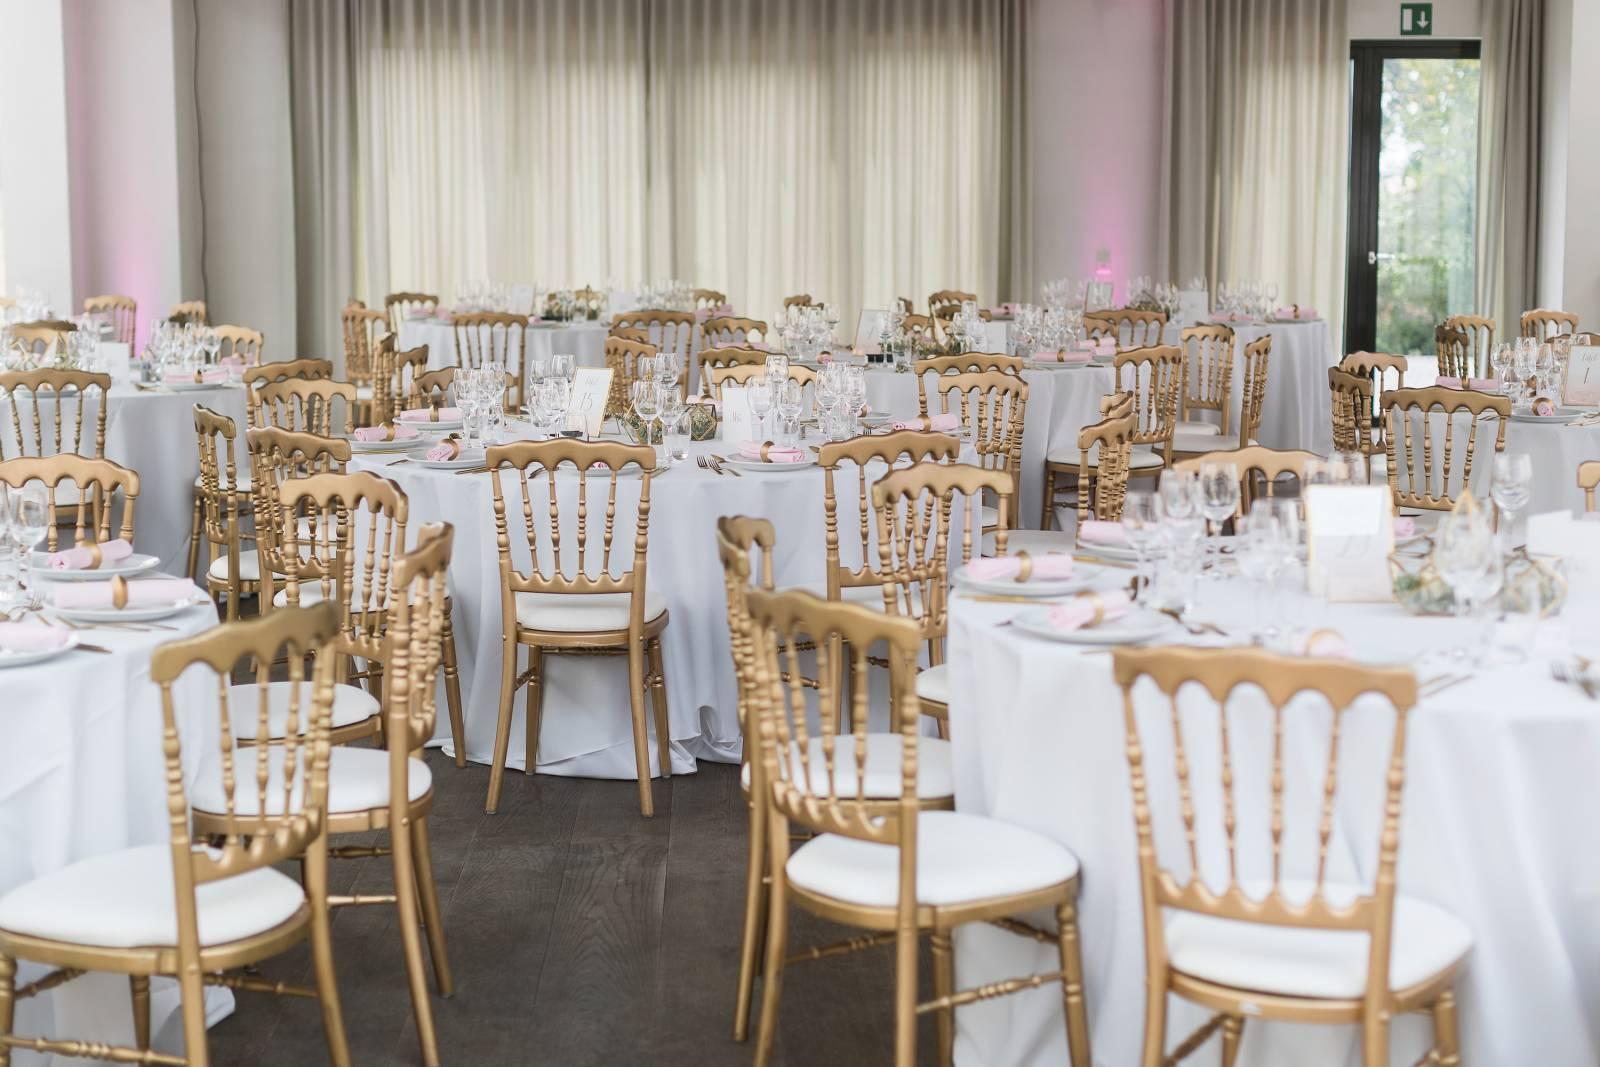 Atelier Rosé - Wedding Planner - House of Weddings Lise & Thomas - Hung Tran Photography (3)